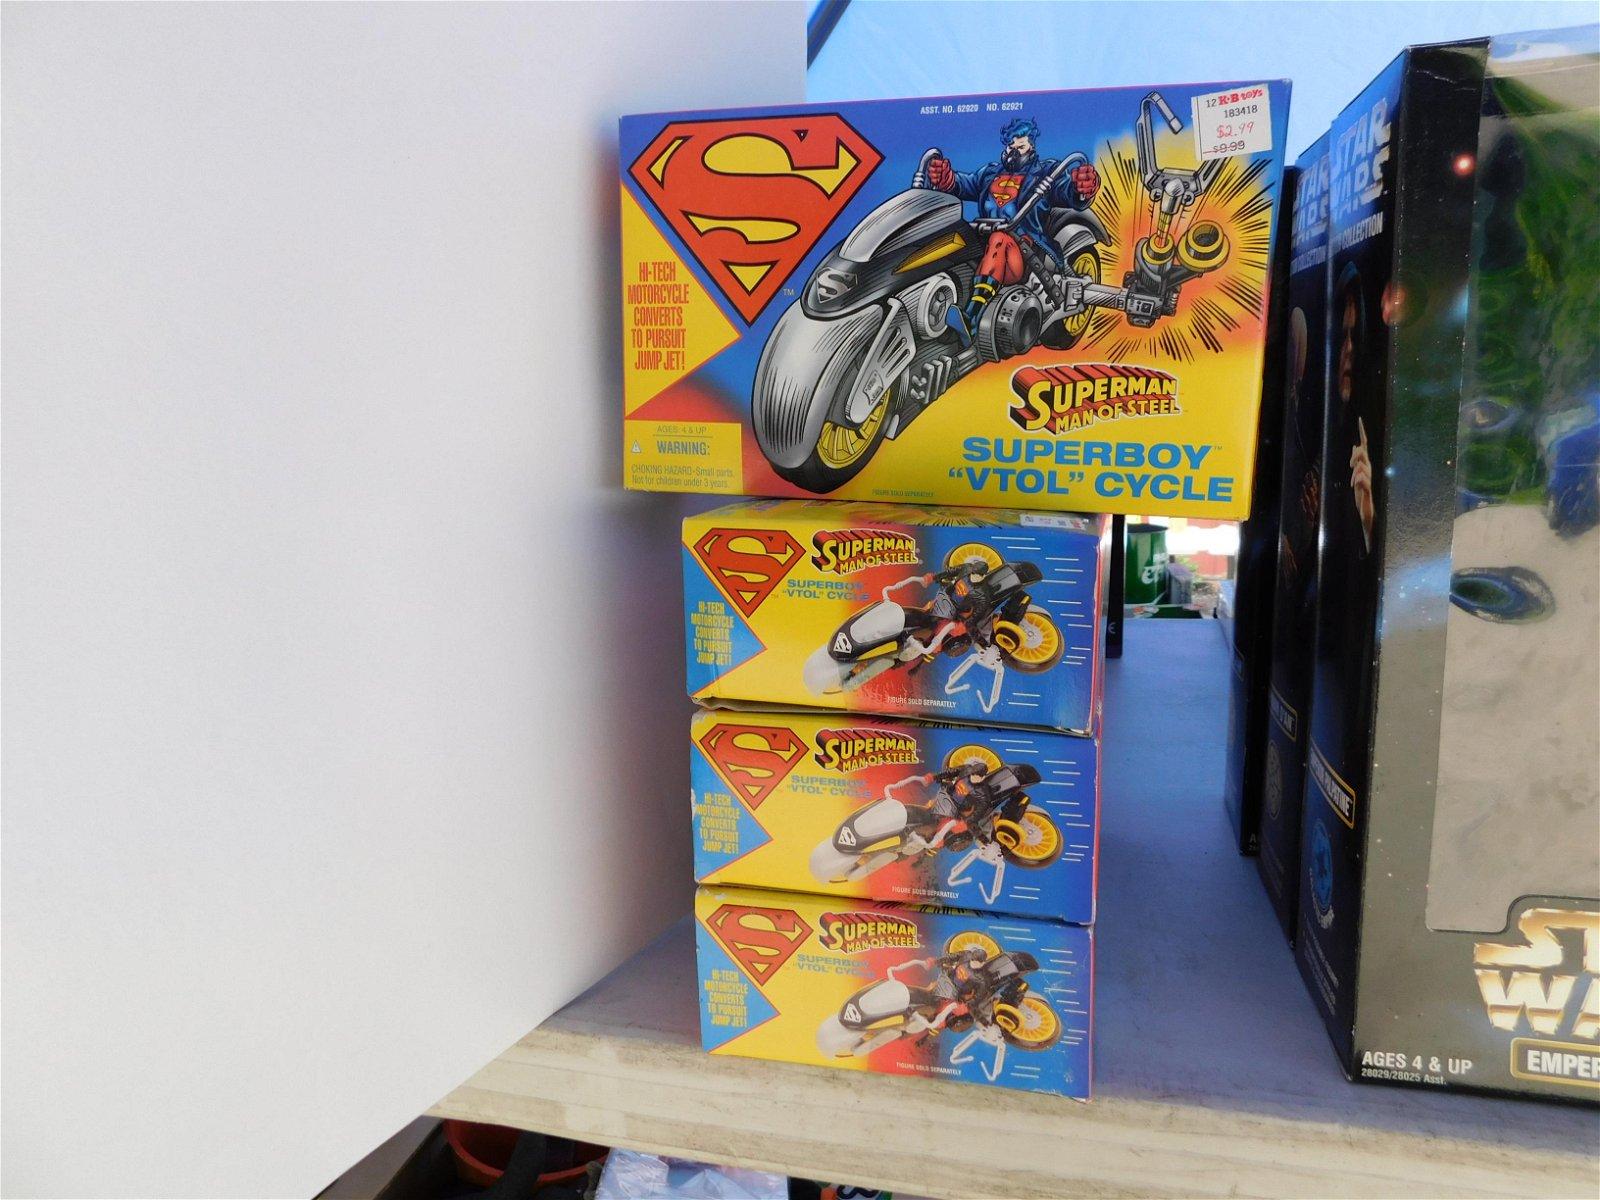 6 Superboy VTOL Cycles